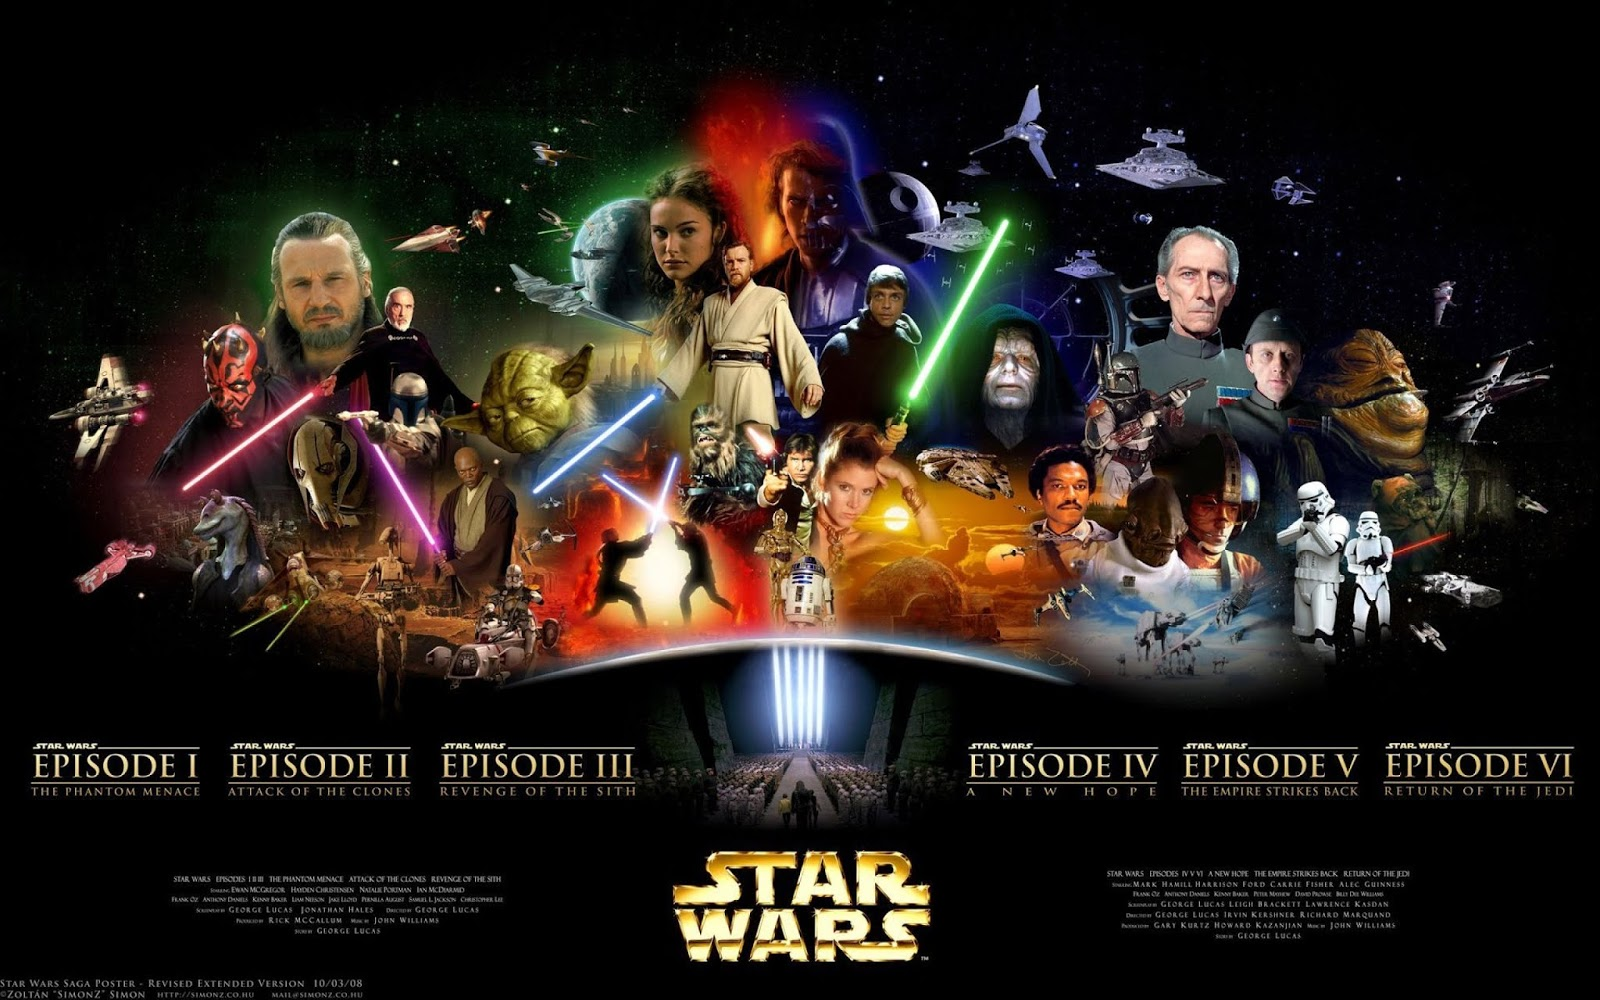 42 Star Wars Wallpapers Hd Wallpaper Carax